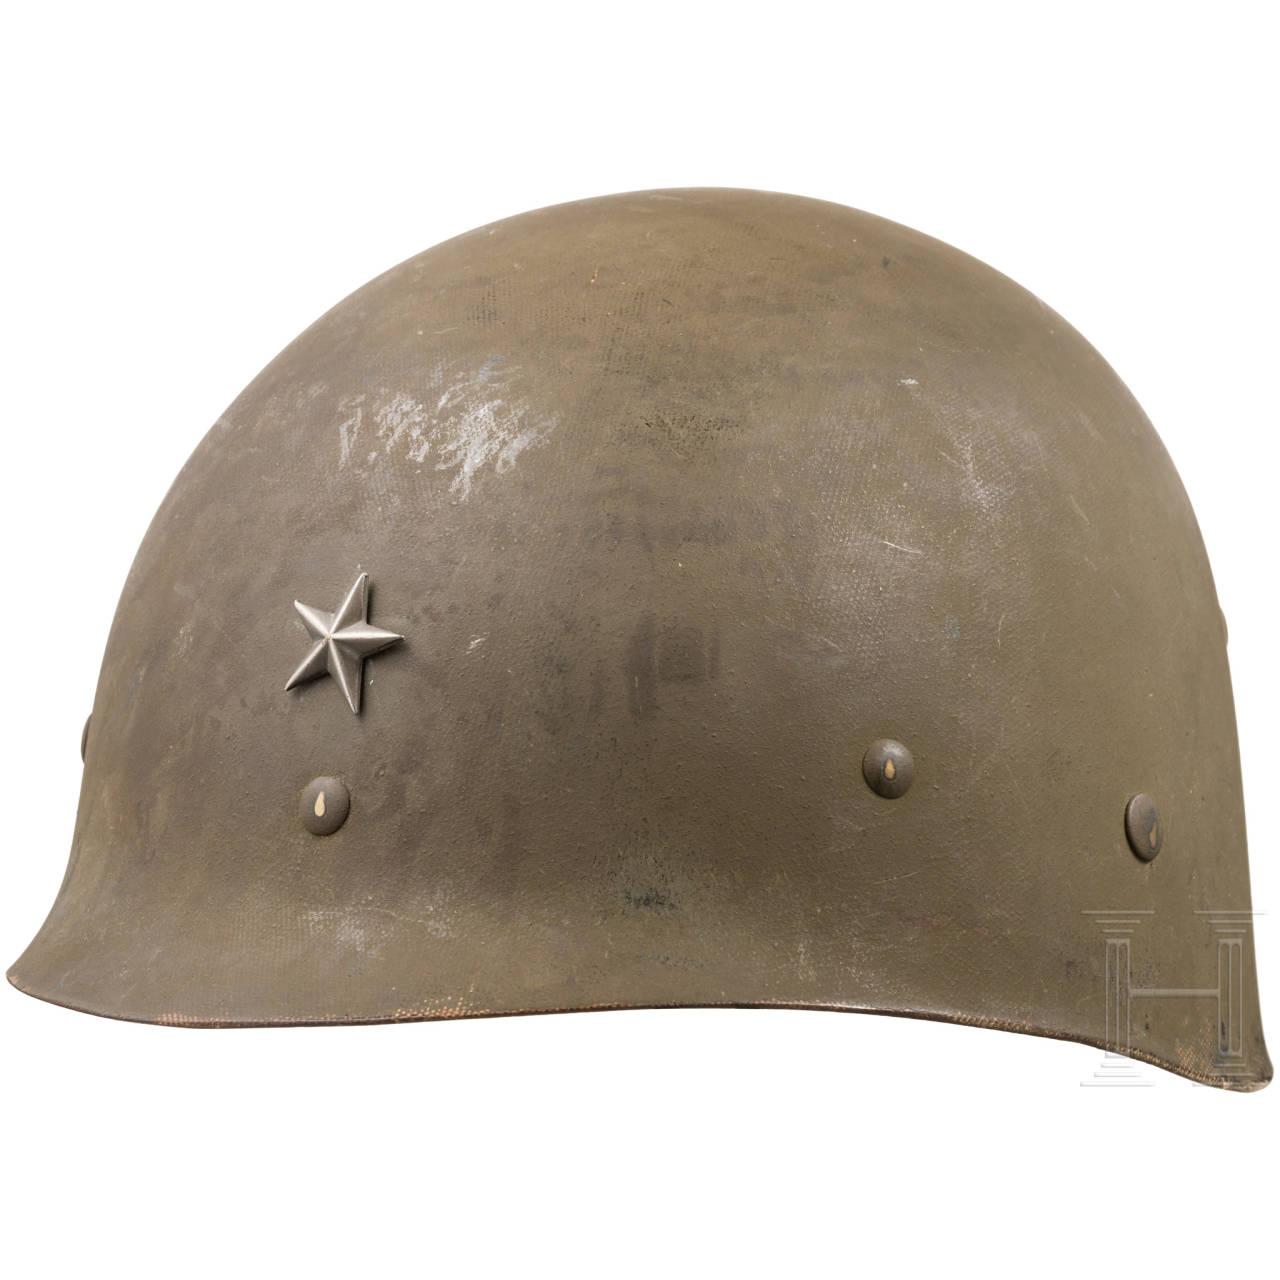 USM 1 helmet liner for a brigadier, 1940s